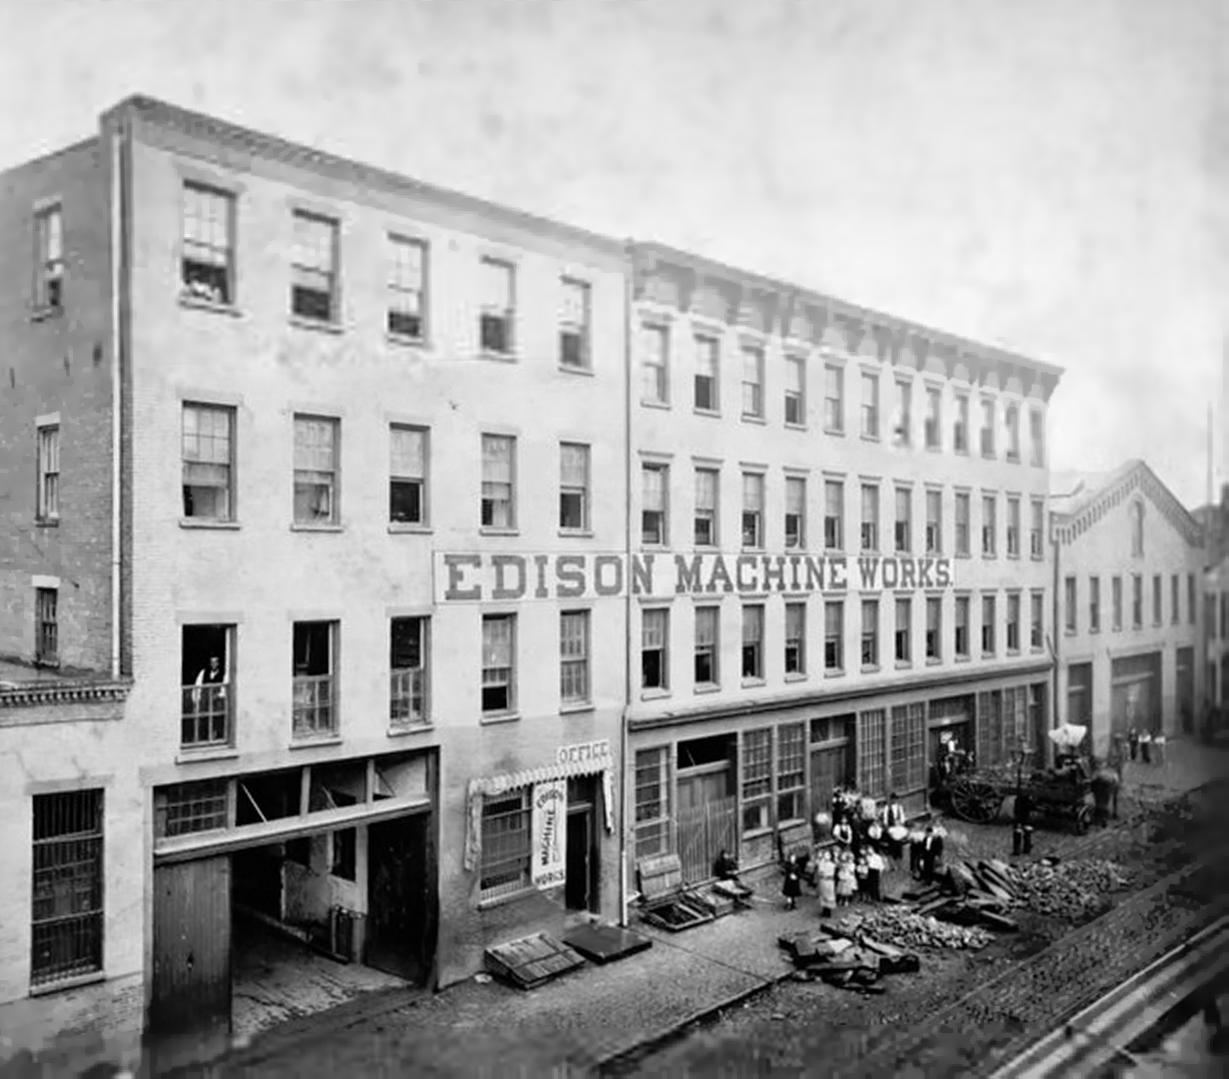 Edison Machine Works on Goerck Street in New York, 1881